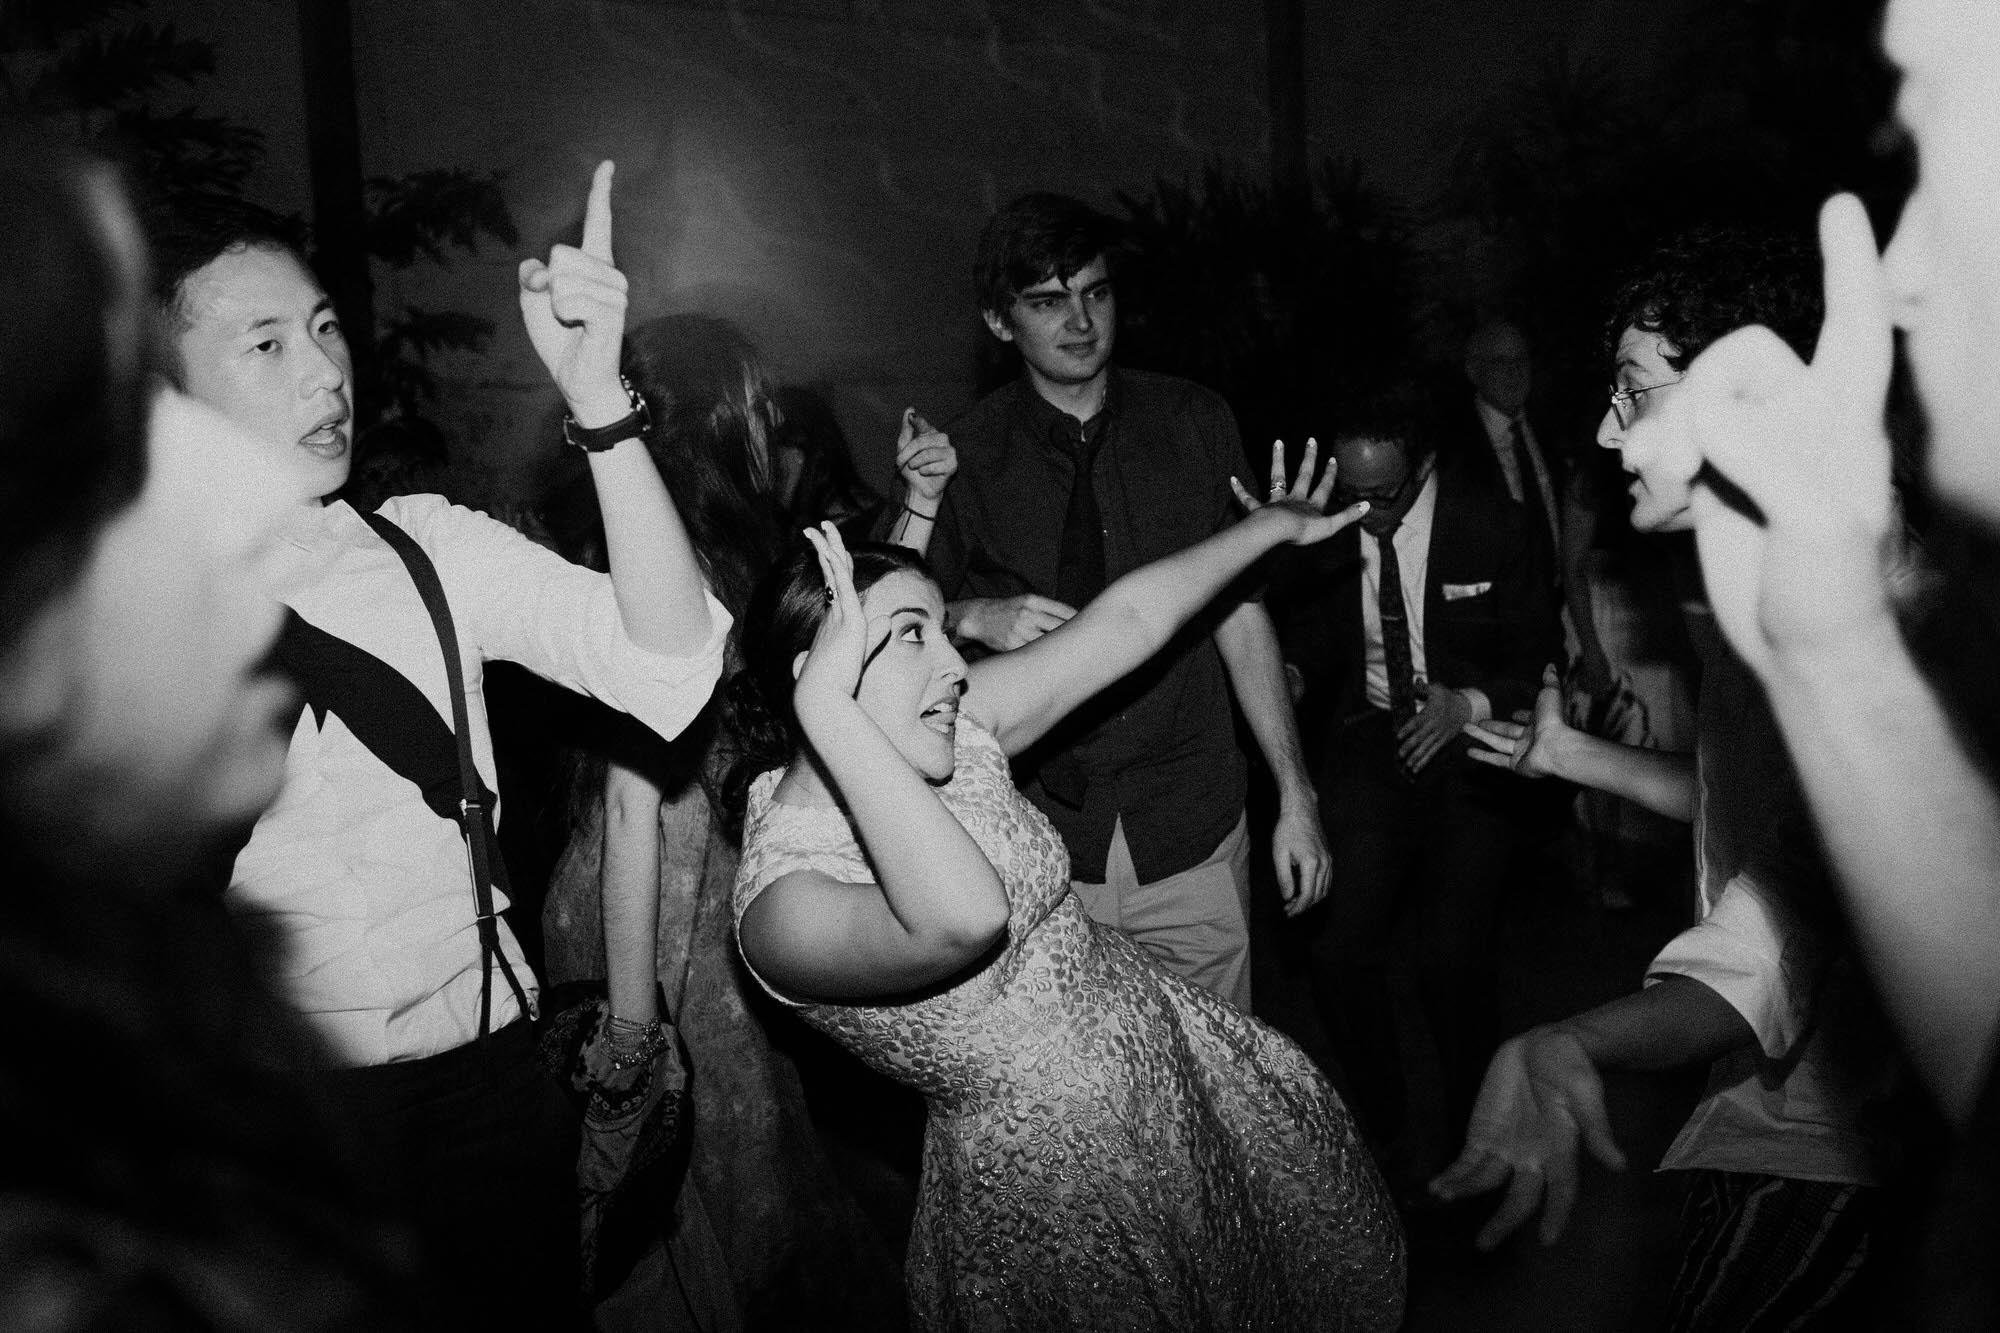 los-angeles-wedding-photographer-millwick-129.jpg